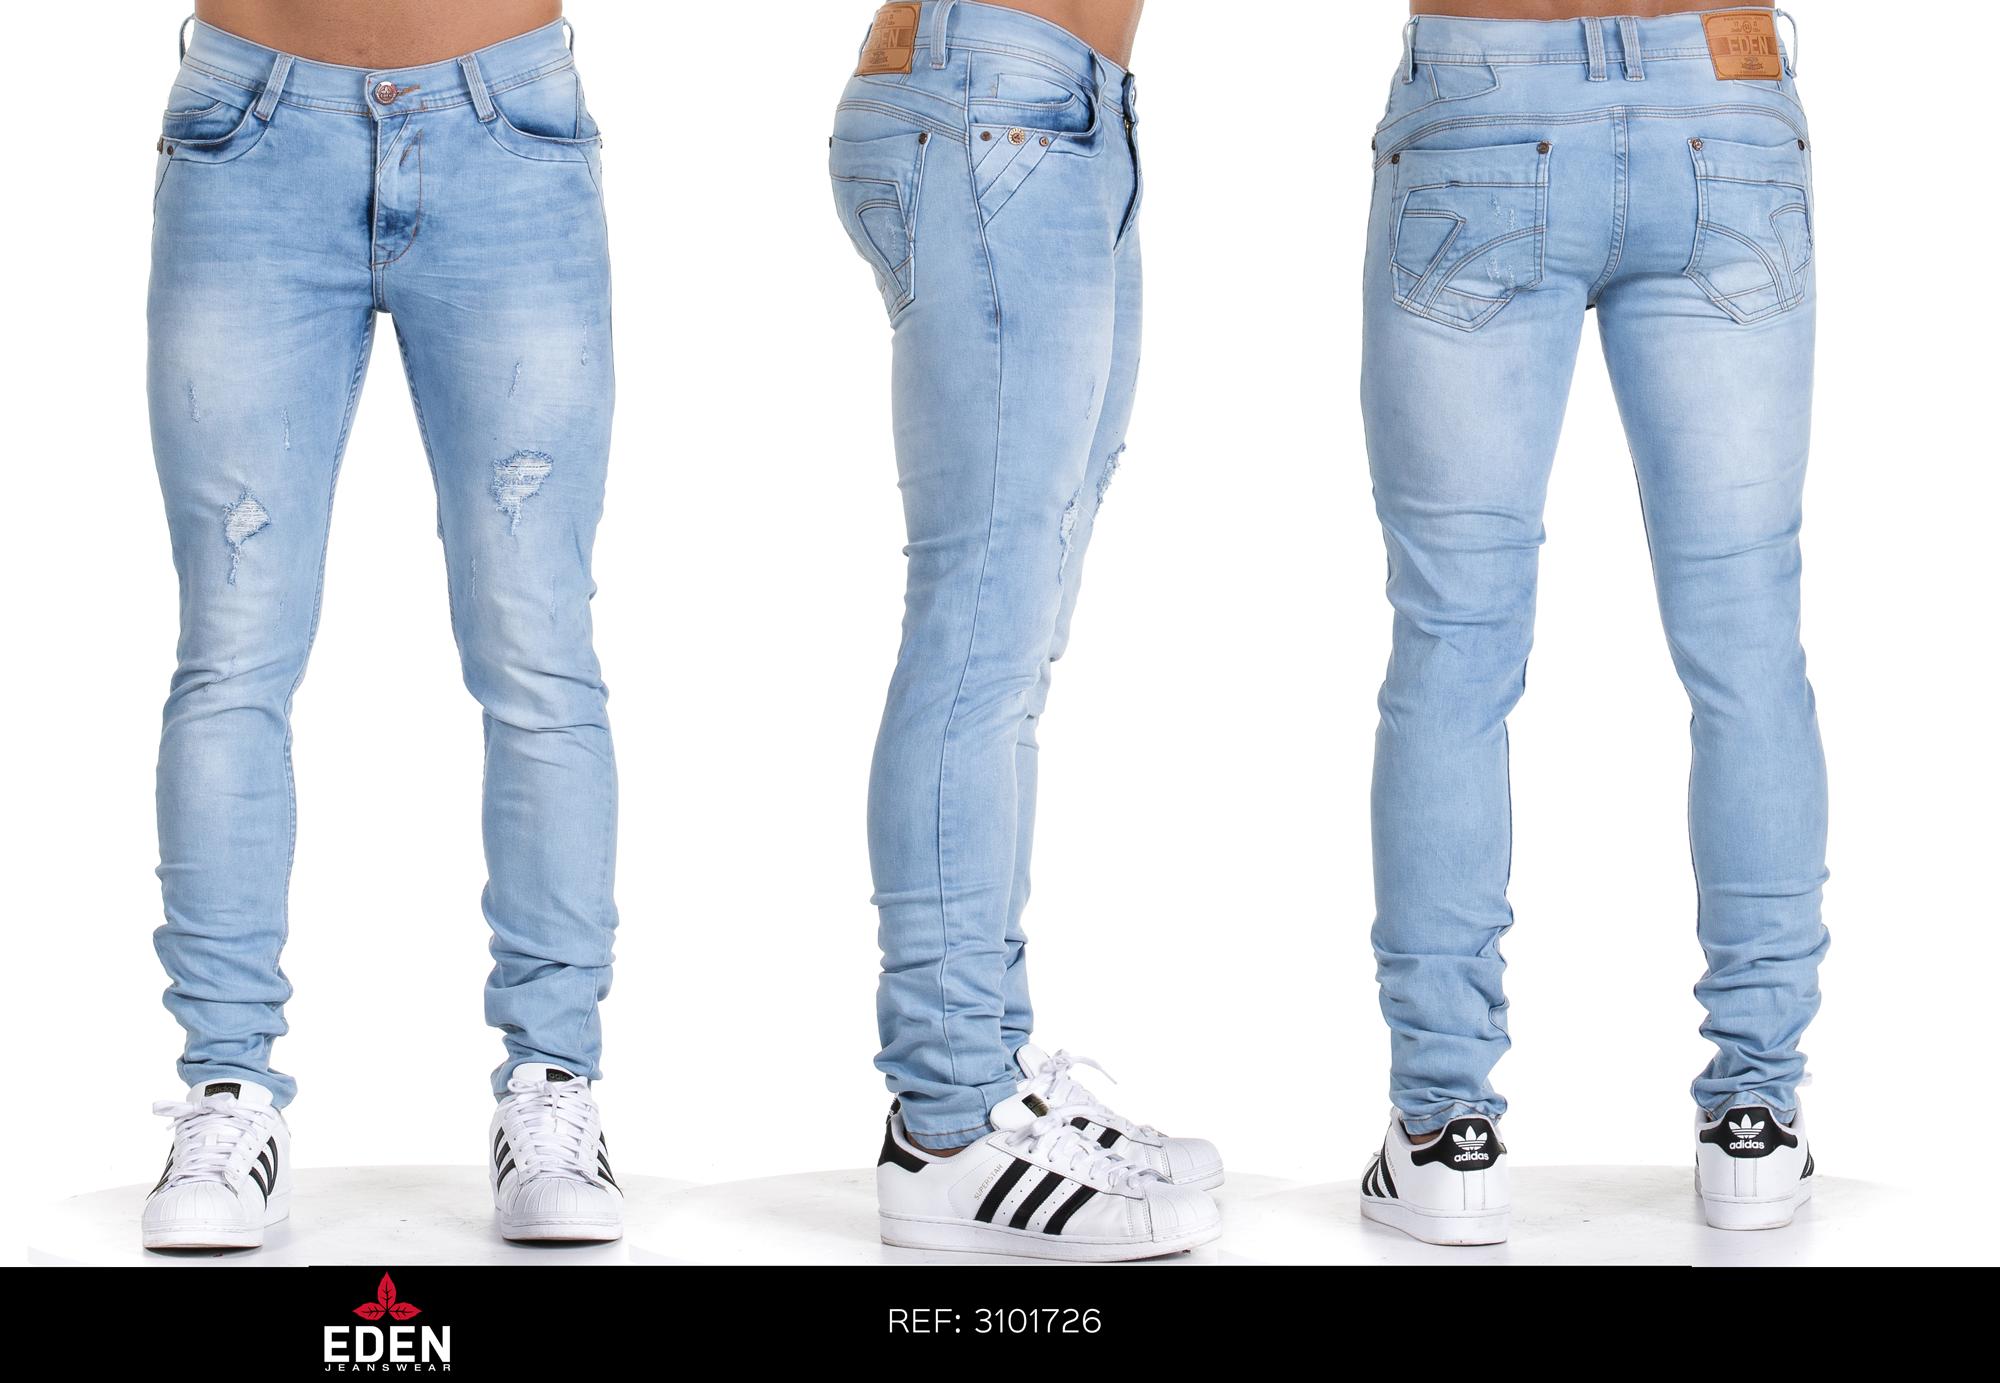 Jean Skinny Saman Confort Ref 3101726 Eden Jeans Vaqueros Pitillo Pantalones De Hombre Jeans Hombre